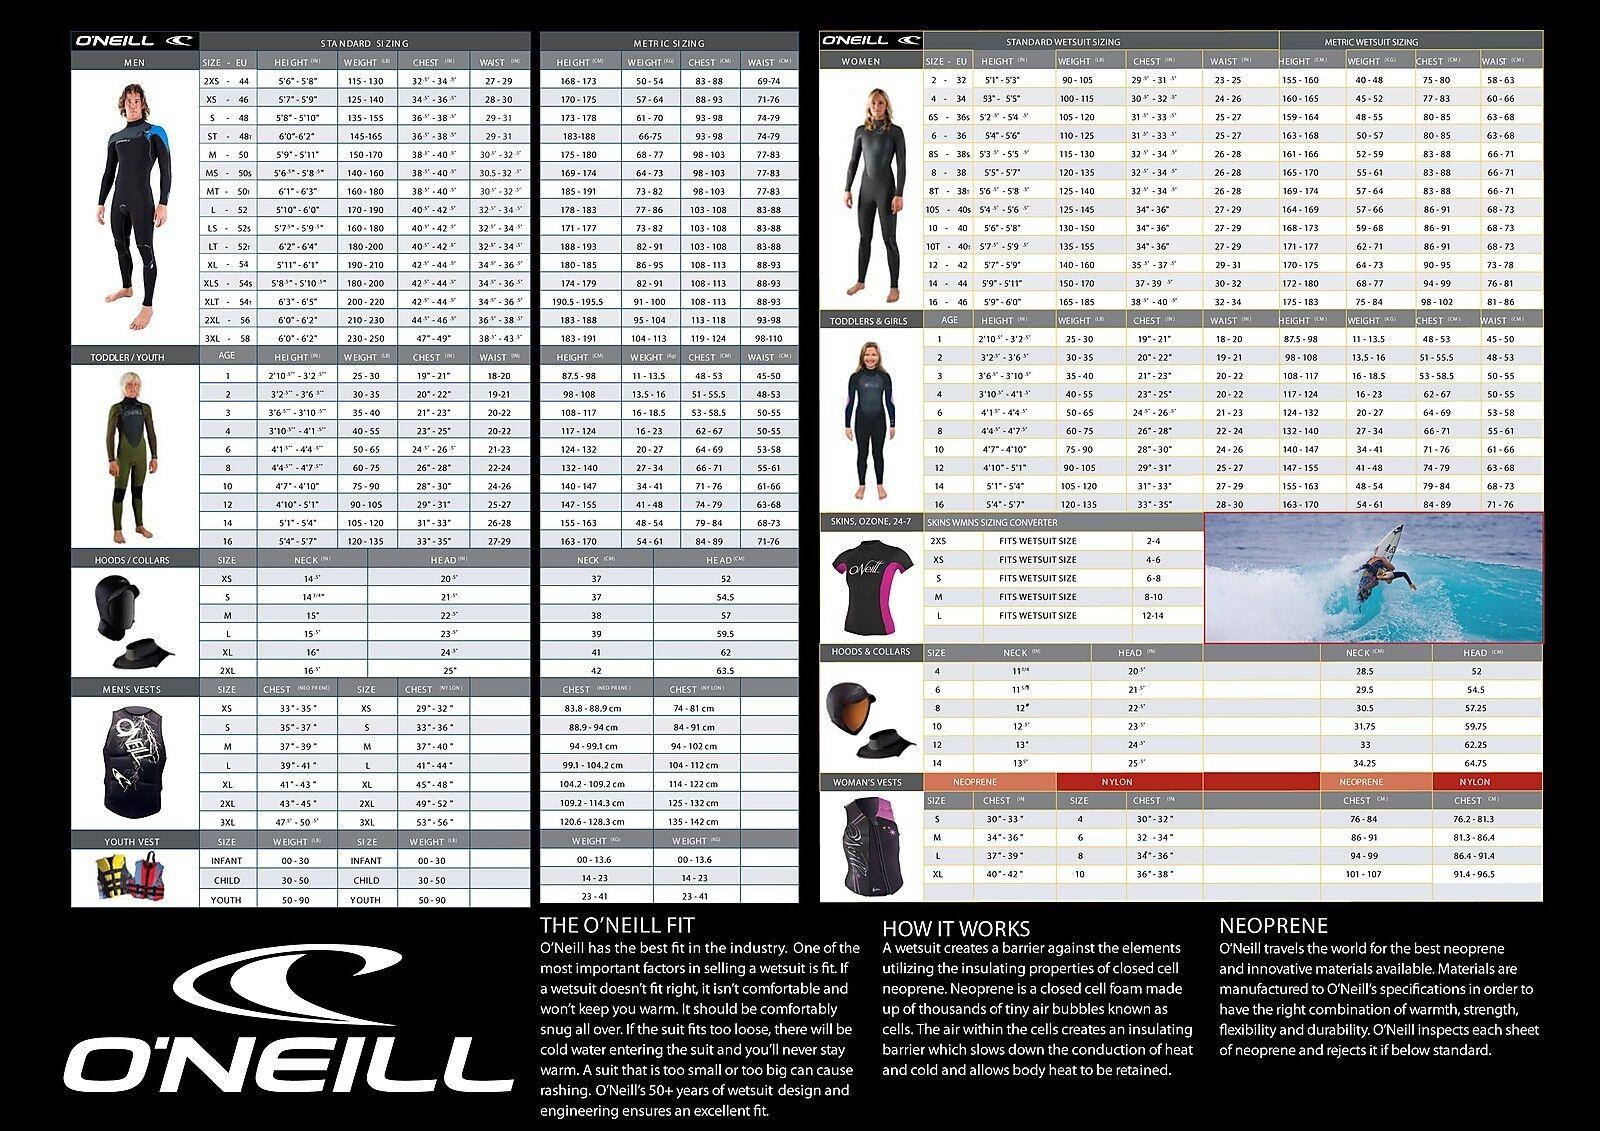 O'Neill Originale Stile  5011 Uomo 3 3 3 2mm Cerniera Torace Muta Intera 1ff322